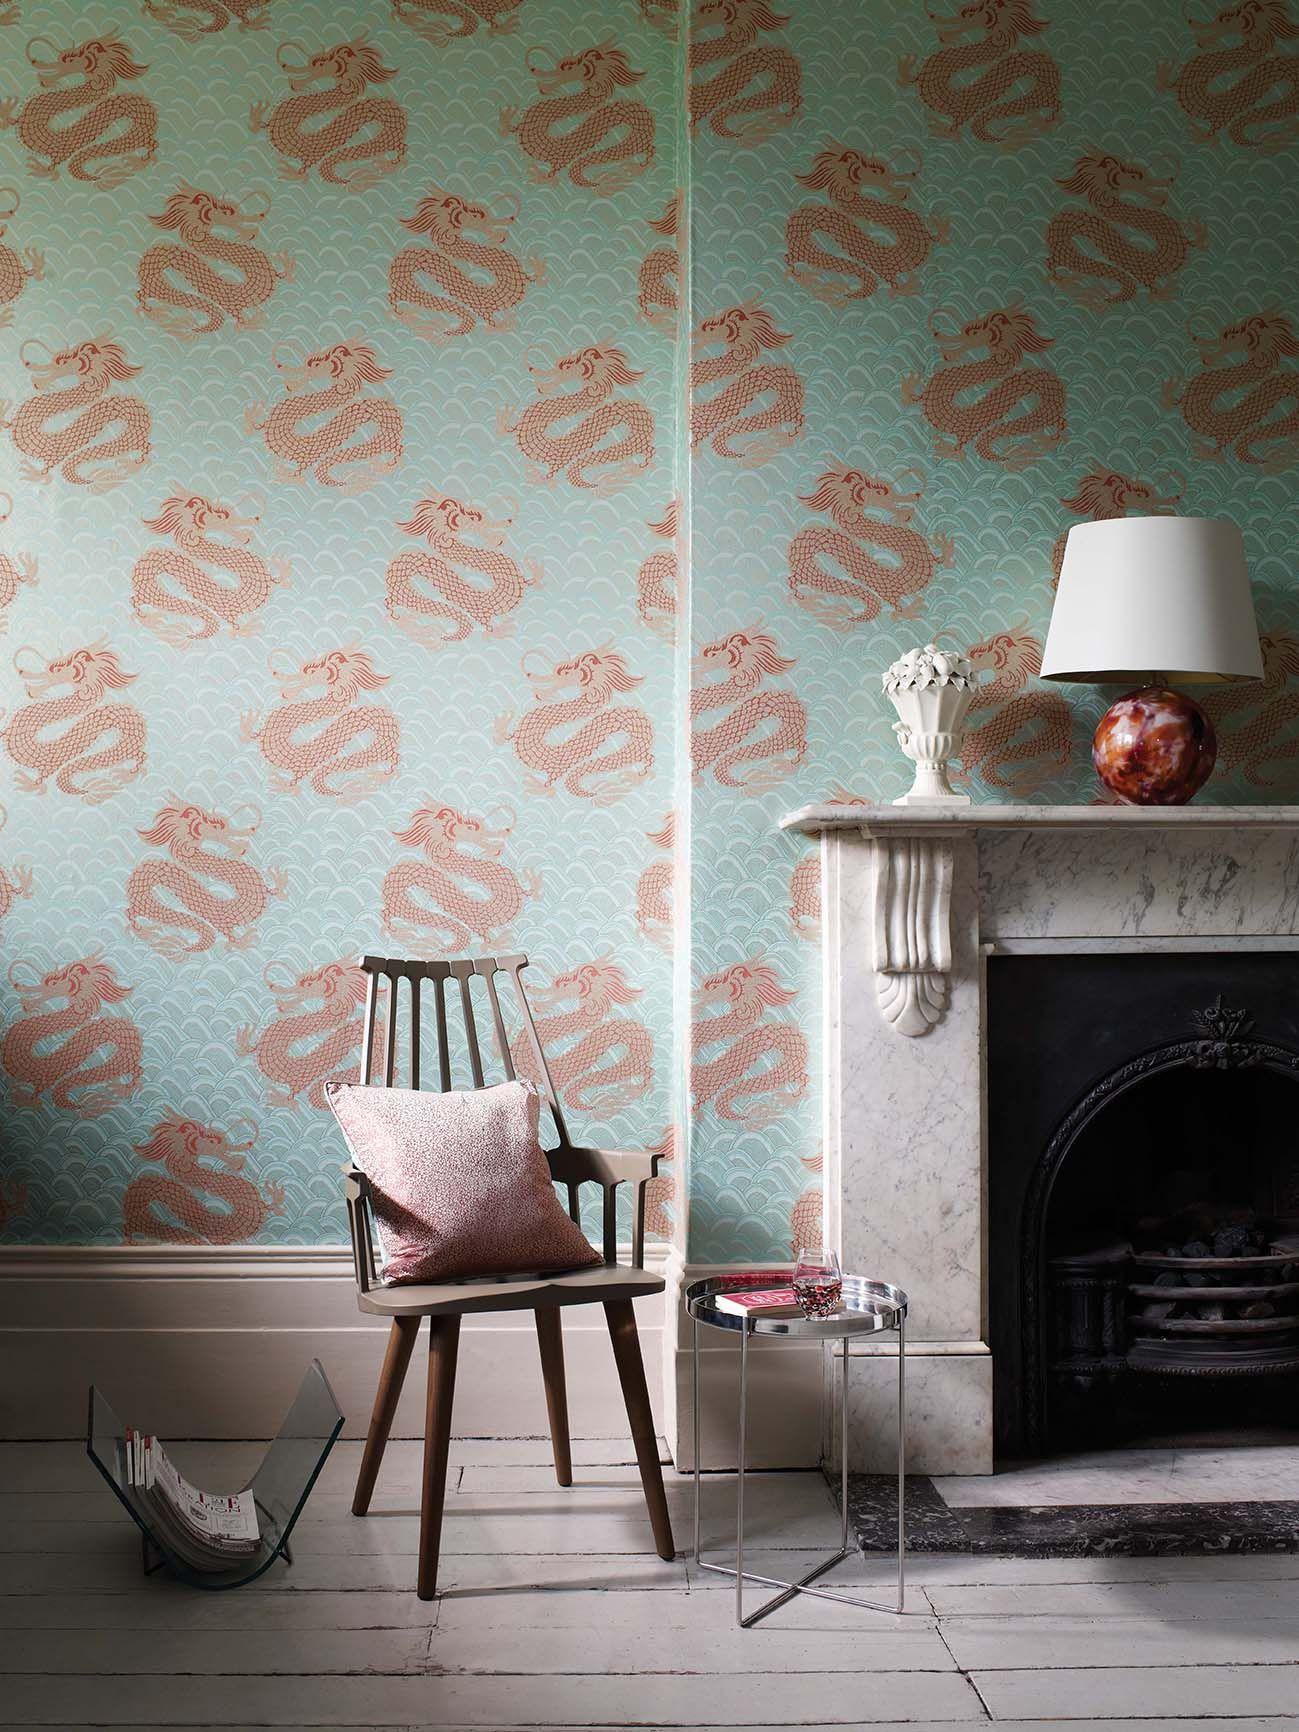 Imperial Home Decor Group Wallpaper Celestial Dragon Wallpaper By Matthew Williamson At Osborne